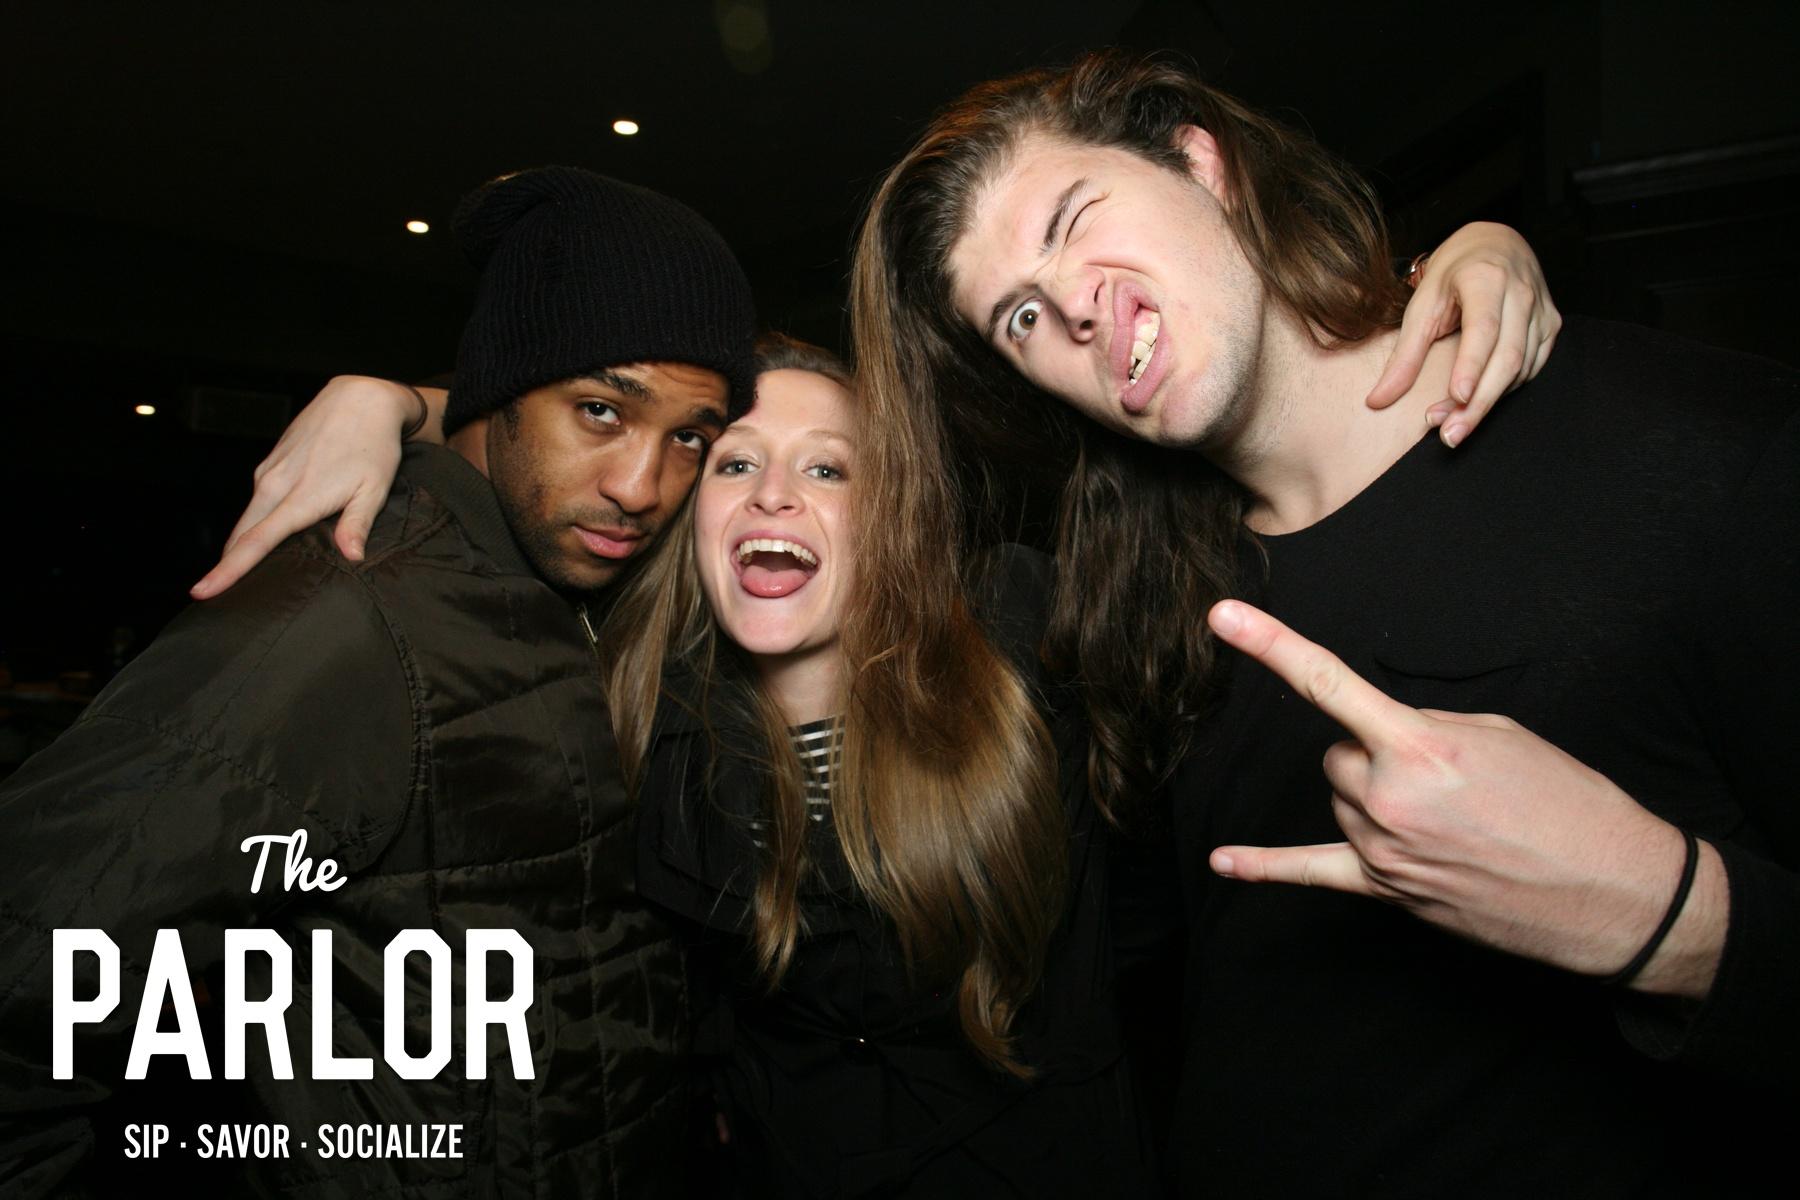 theparlor-photo-0301.jpg